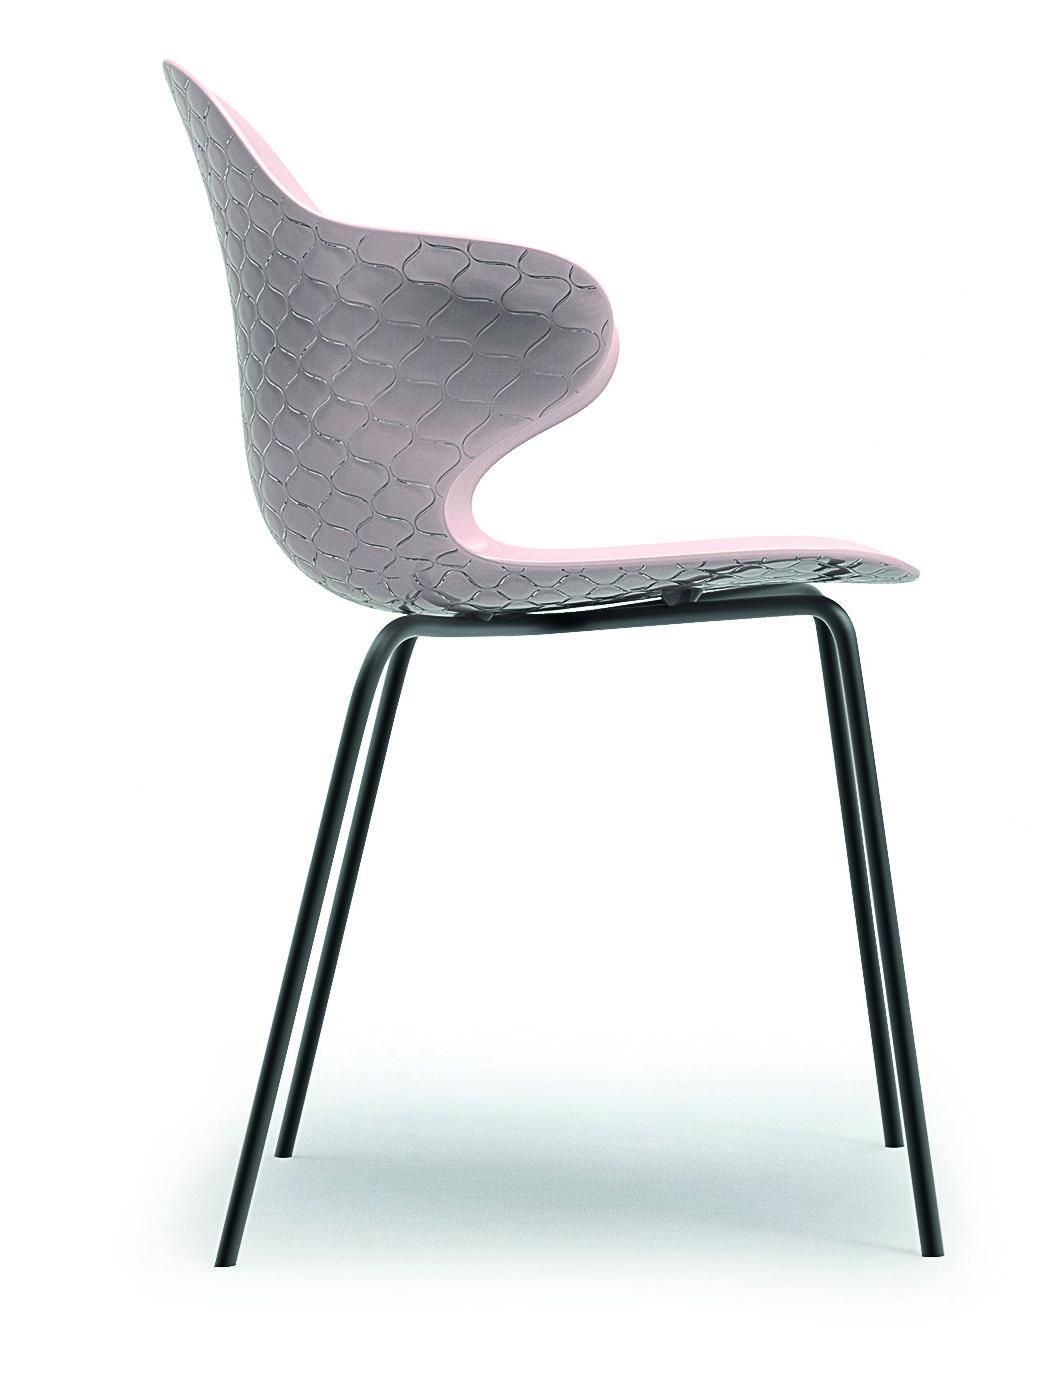 Emejing calligaris sedie prezzi gallery acrylicgiftware for Sedie design opinioni